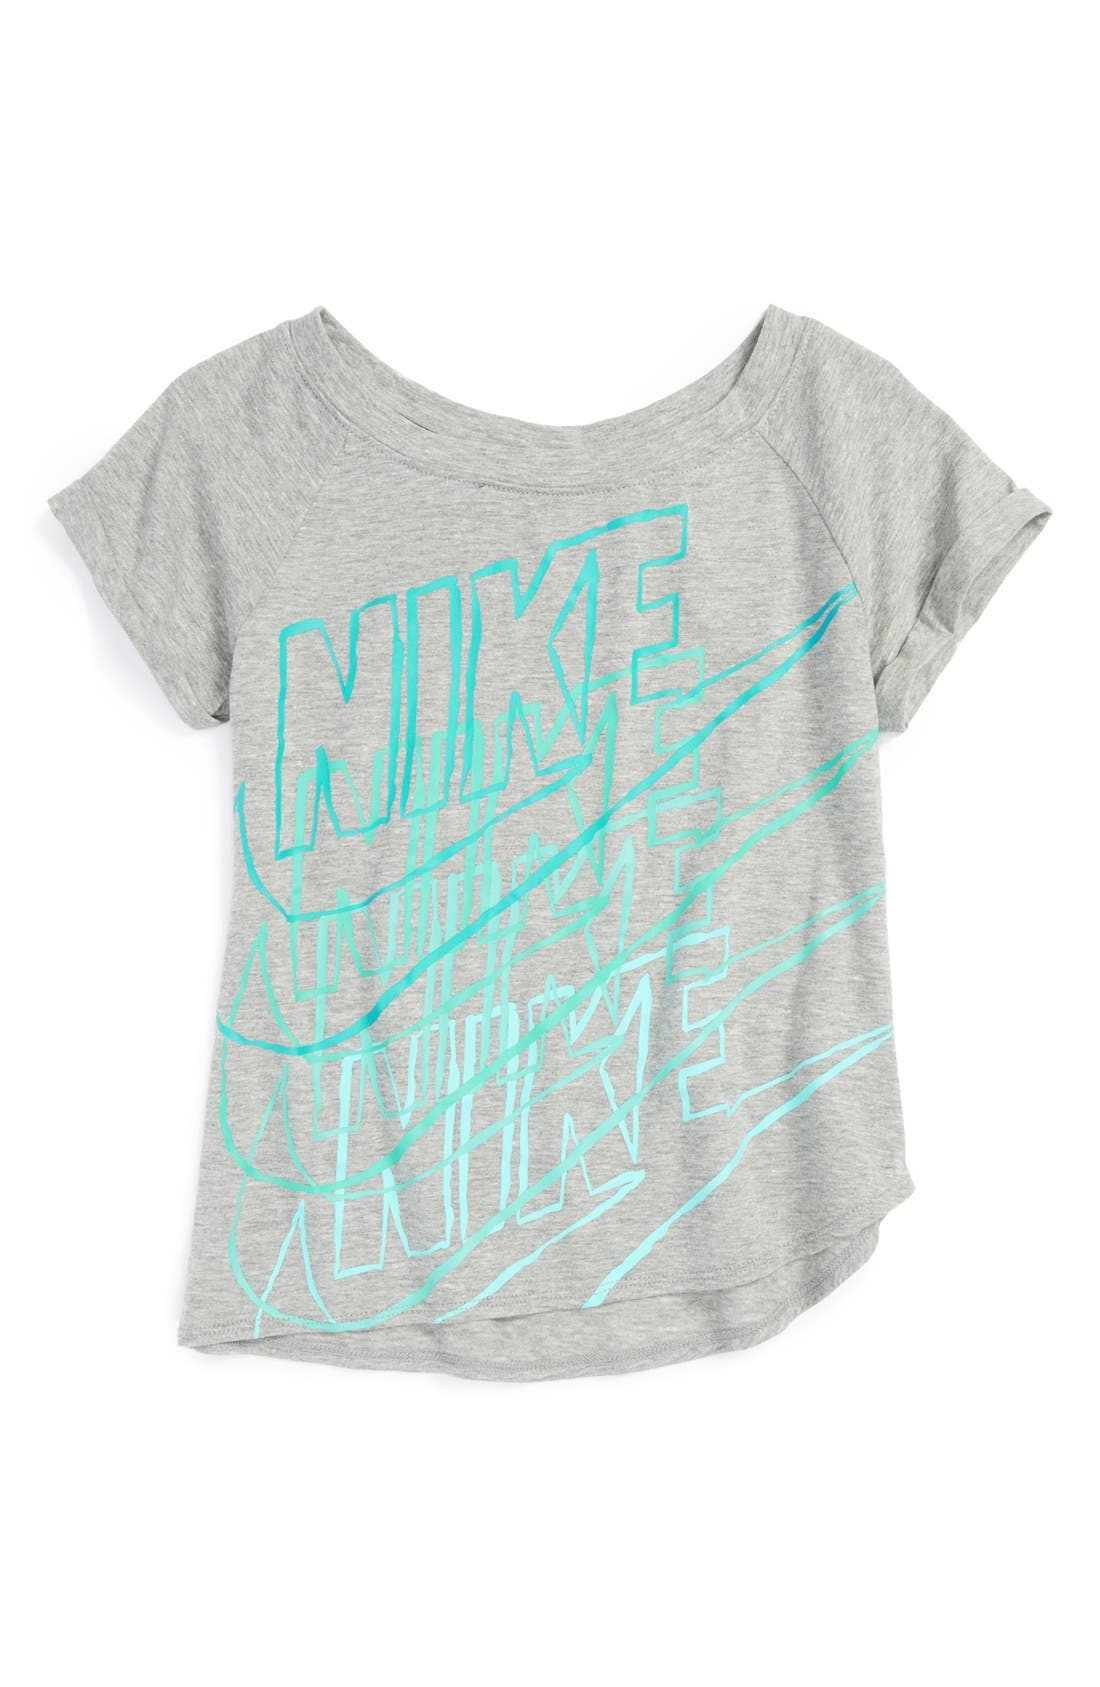 Main Image - Nike Graphic Tee (Little Girls & Big Girls)